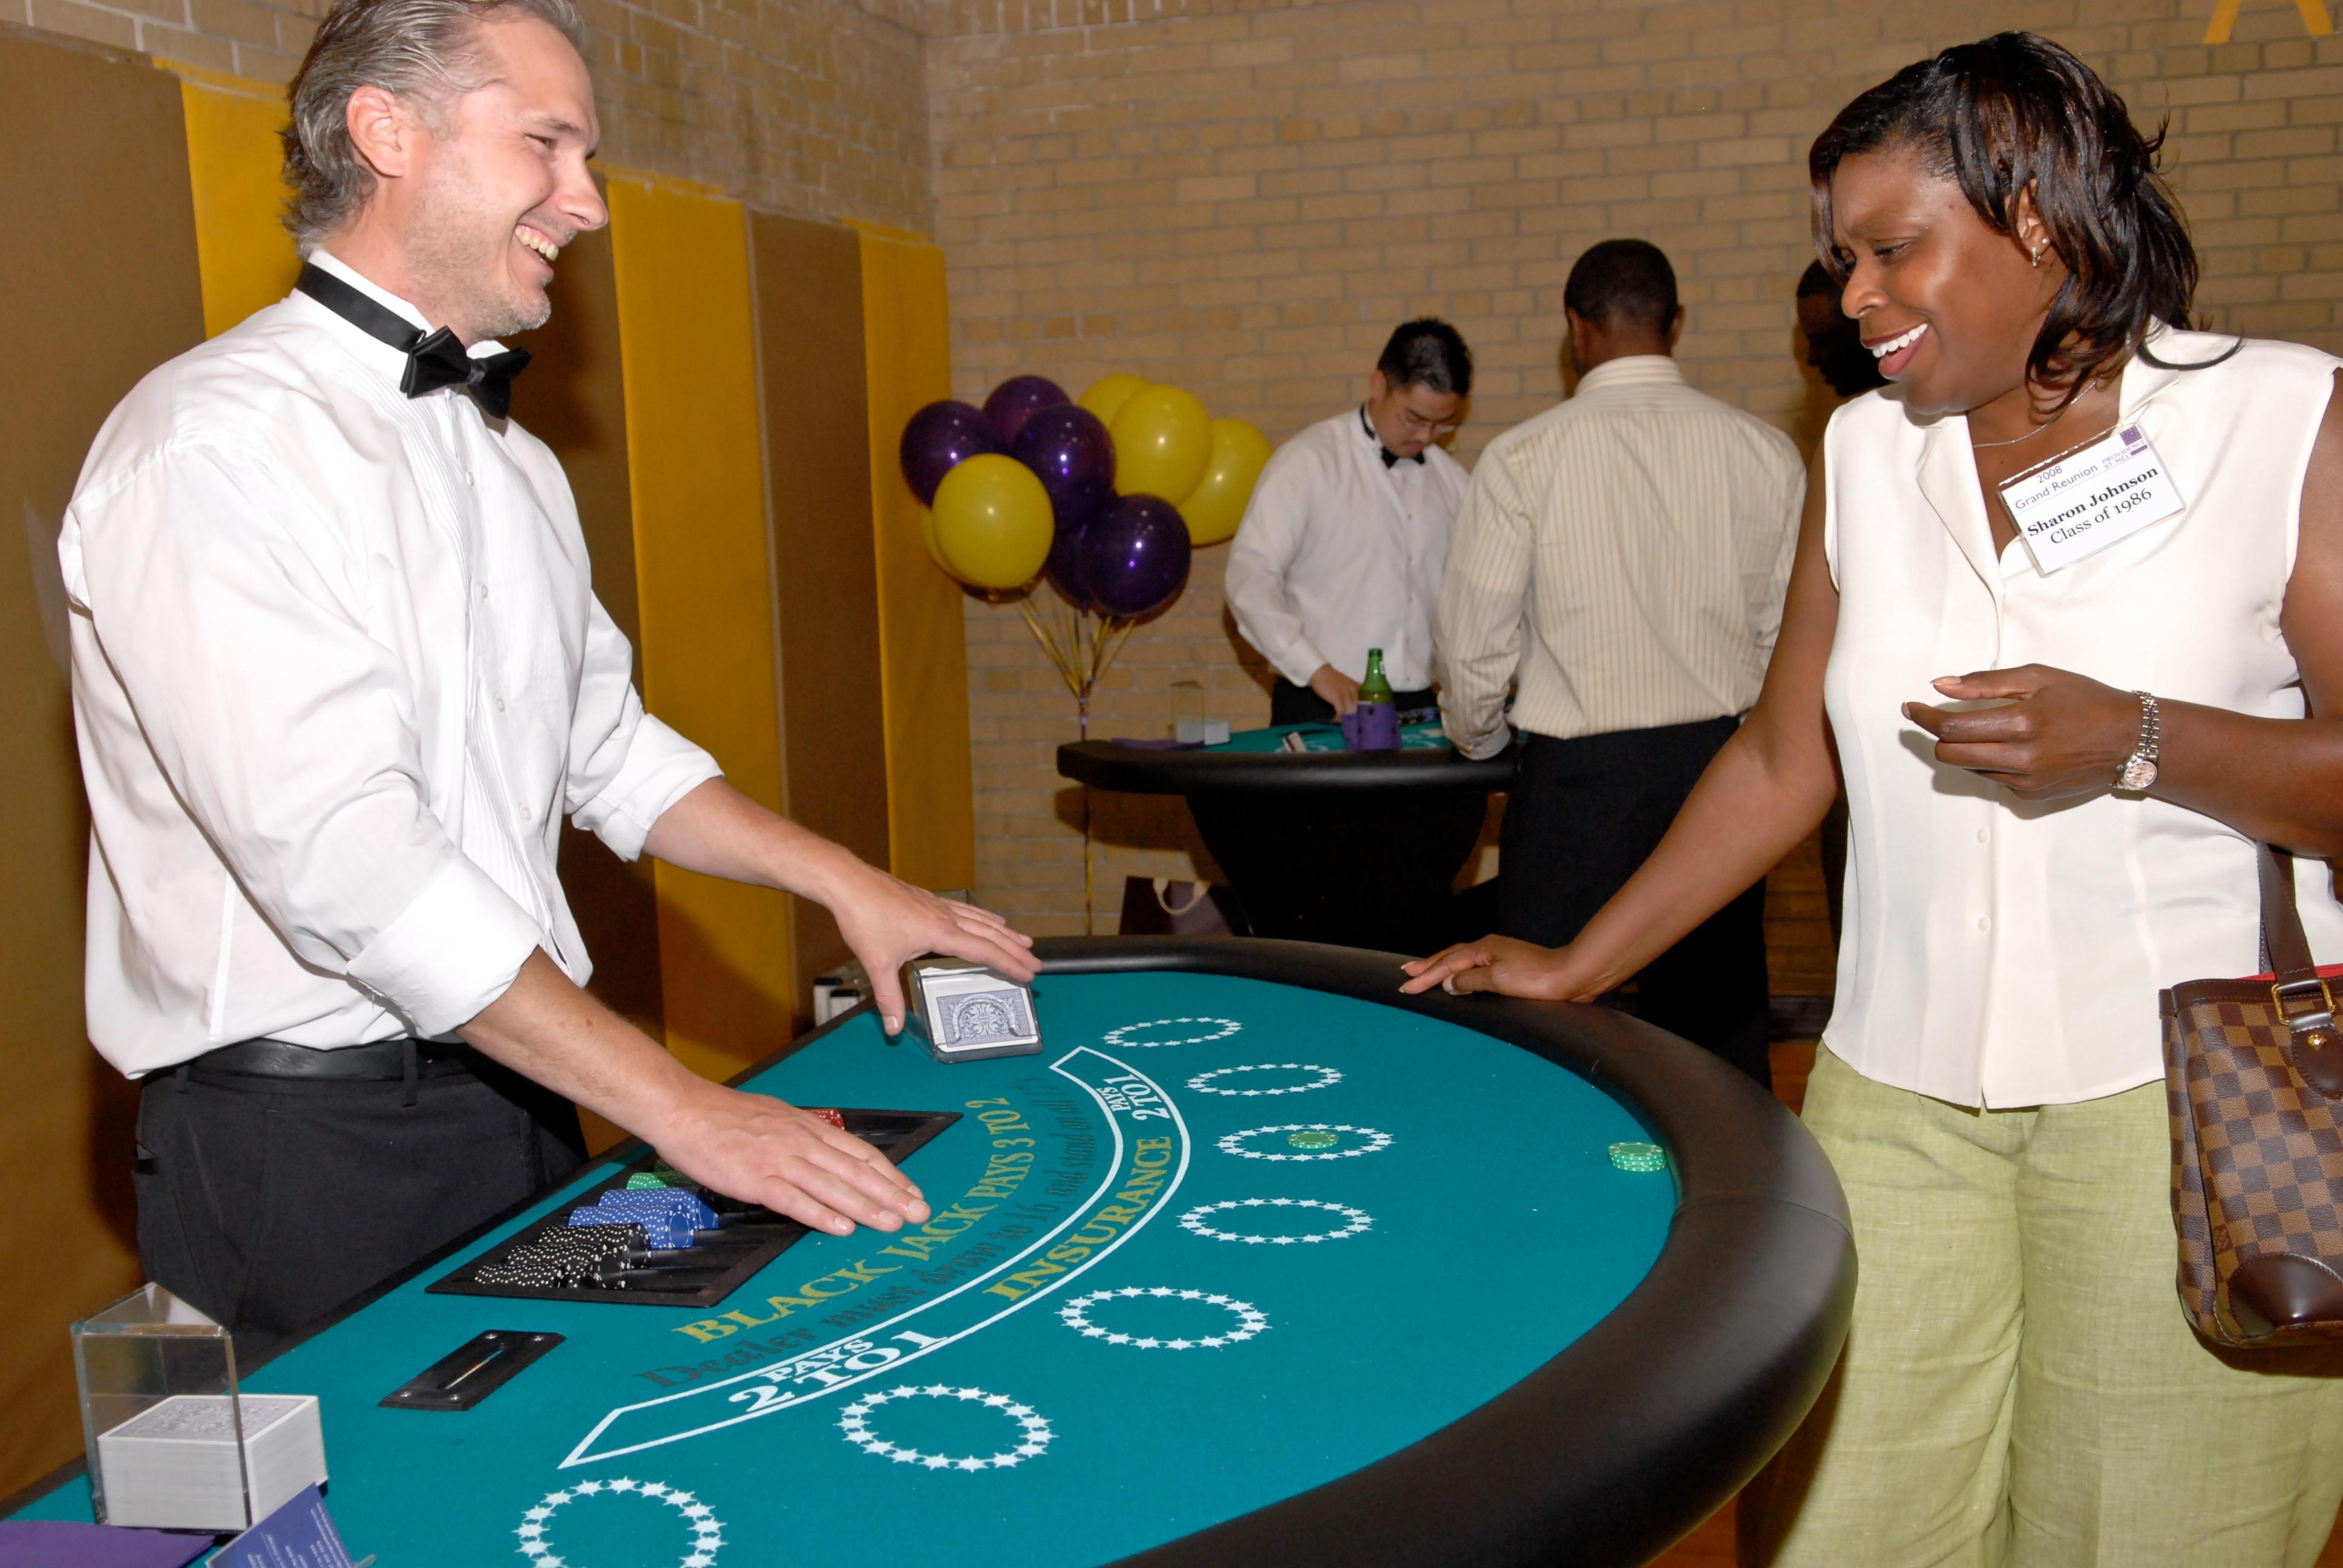 Houston Casino & Poker Rentals image 1